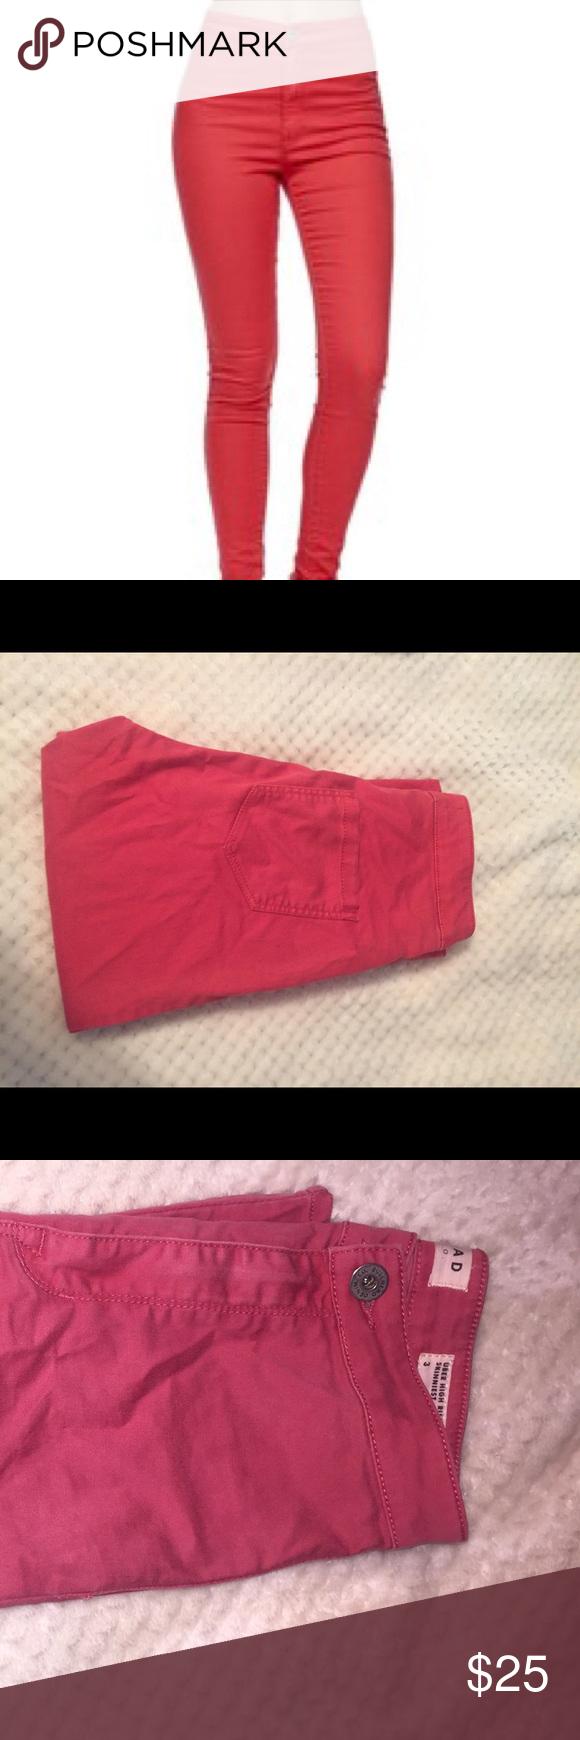 Bullhead Uber High Rise Skinniest Hot Pink Jeans hot pink super comfy high waisted jeans Bullhead Jeans Skinny